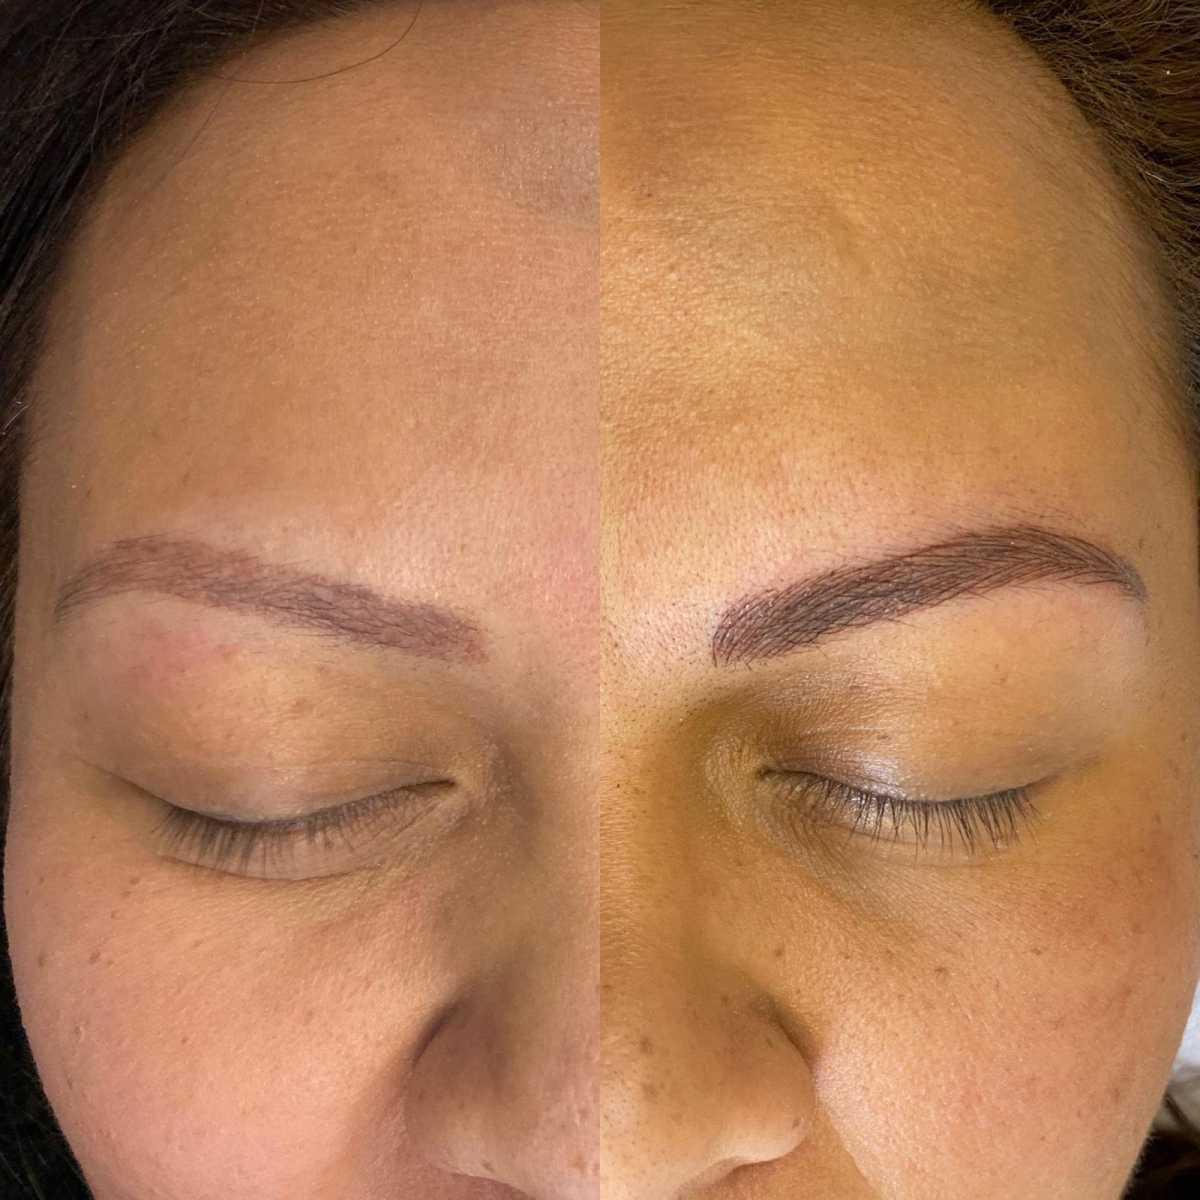 How Long Does Eyebrow Tattoo Last?